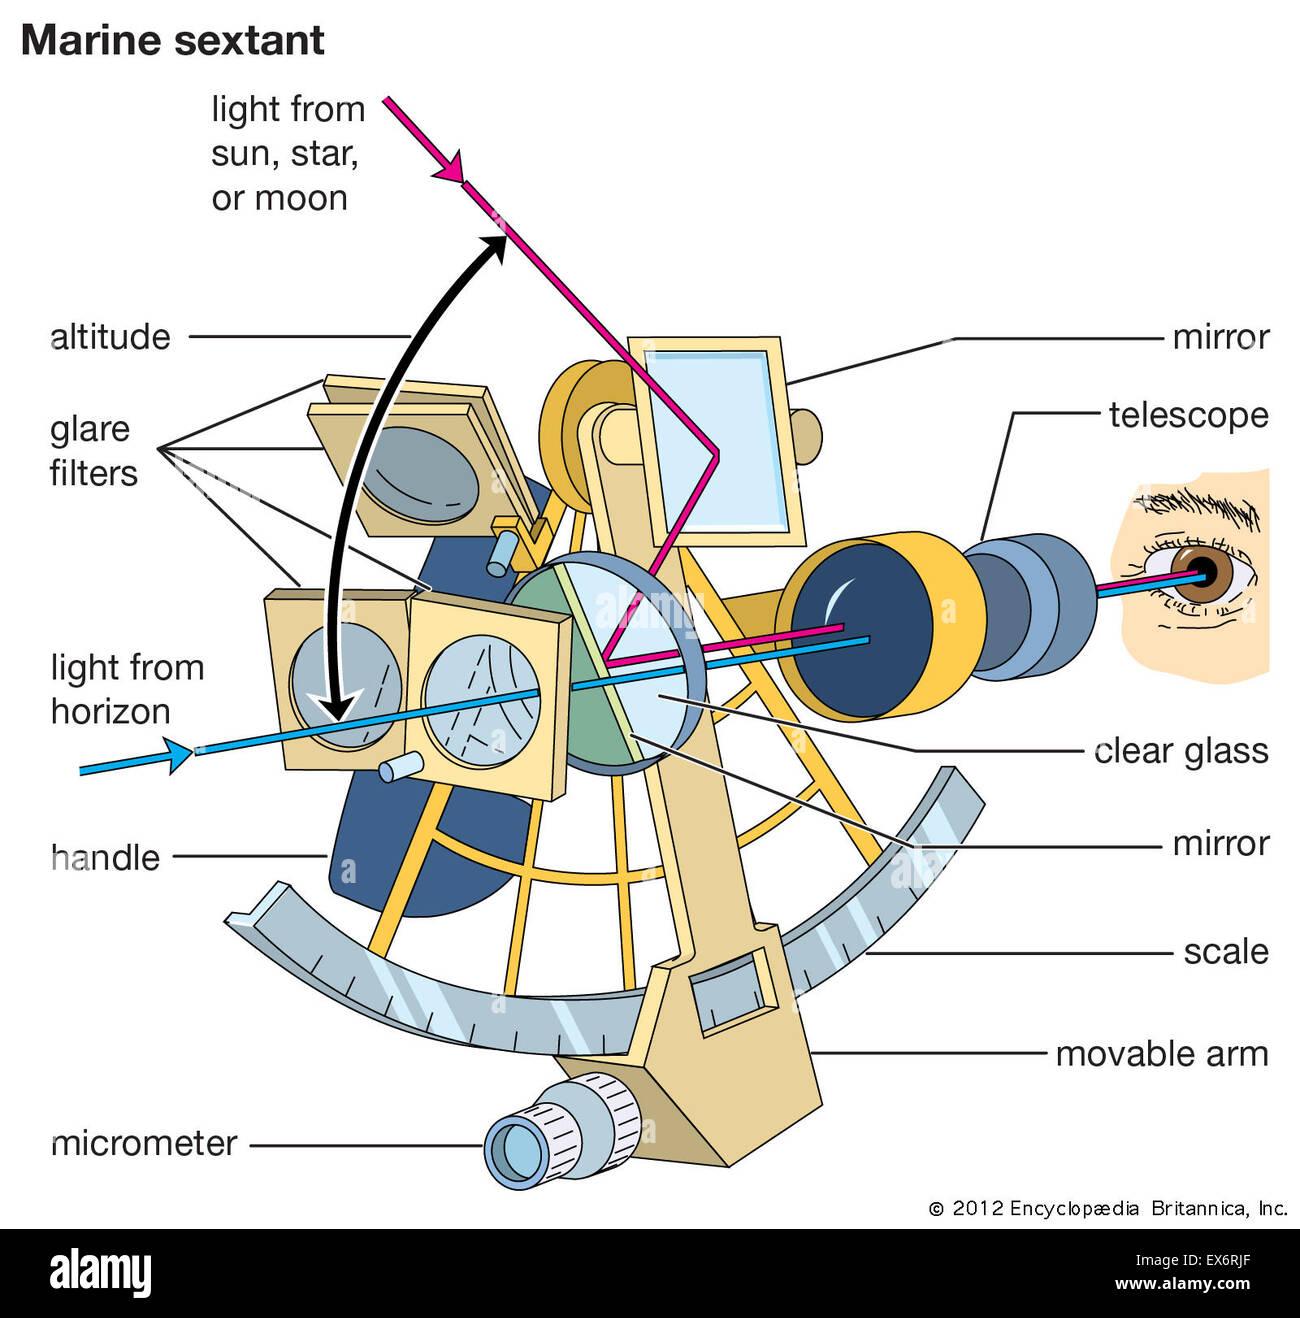 Marinetant Stockfotos Amp Marinetant Bilder